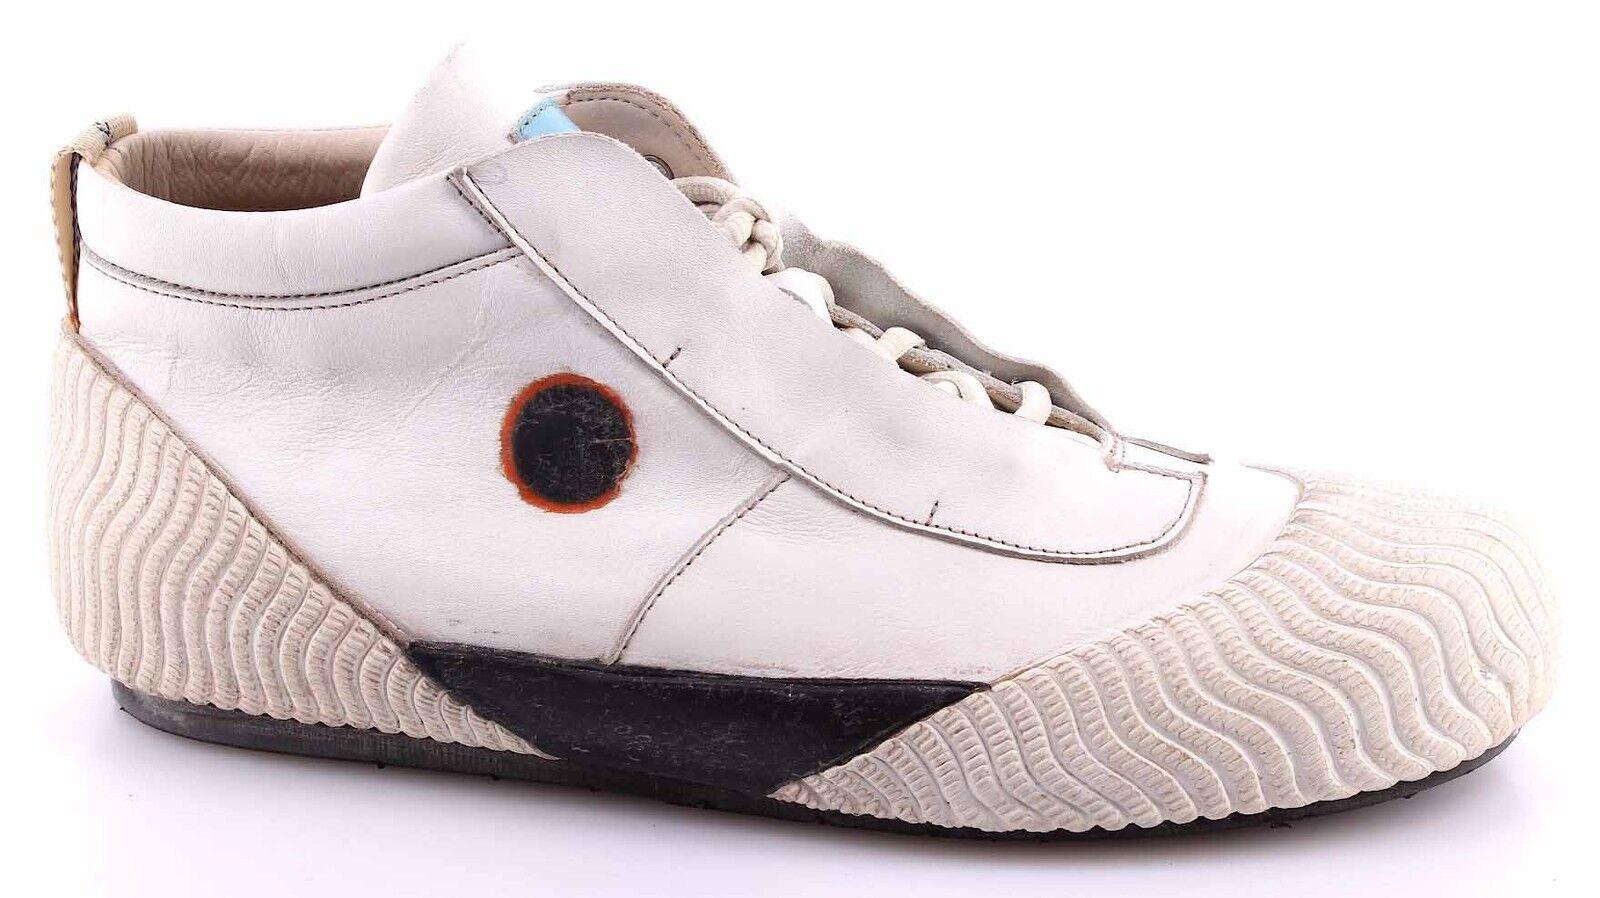 Scarpe Sneakers Uomo Pelle MOMA 13501-6 Softy White Pelle Uomo Bianco Vintage Estremo Nuove 9319ce